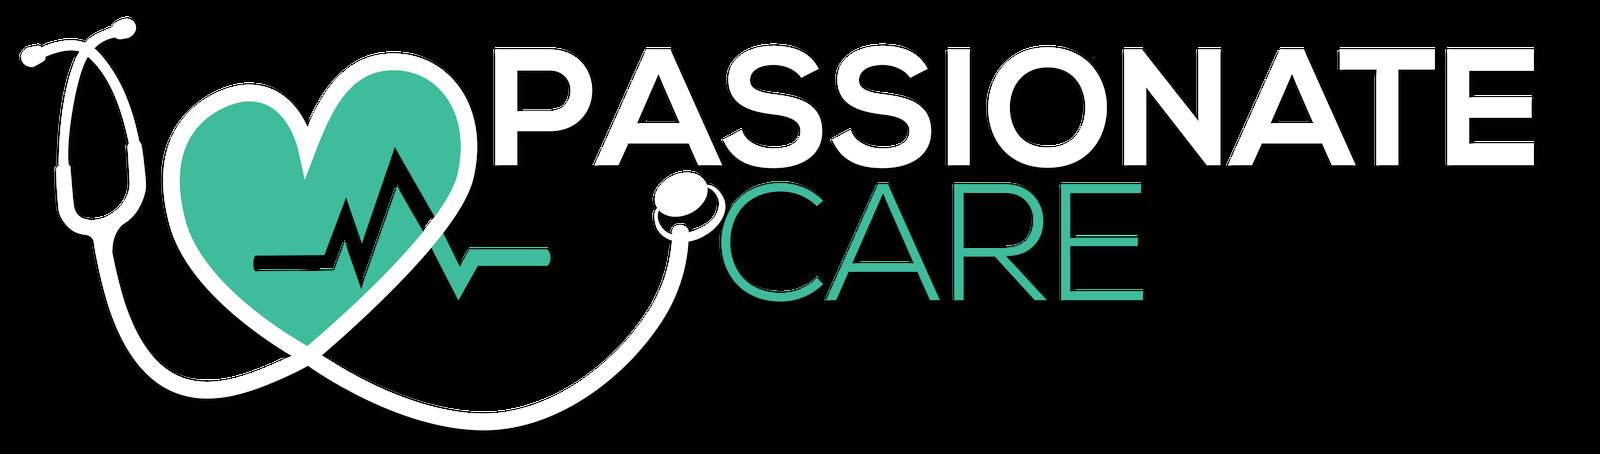 Passionate Care Store